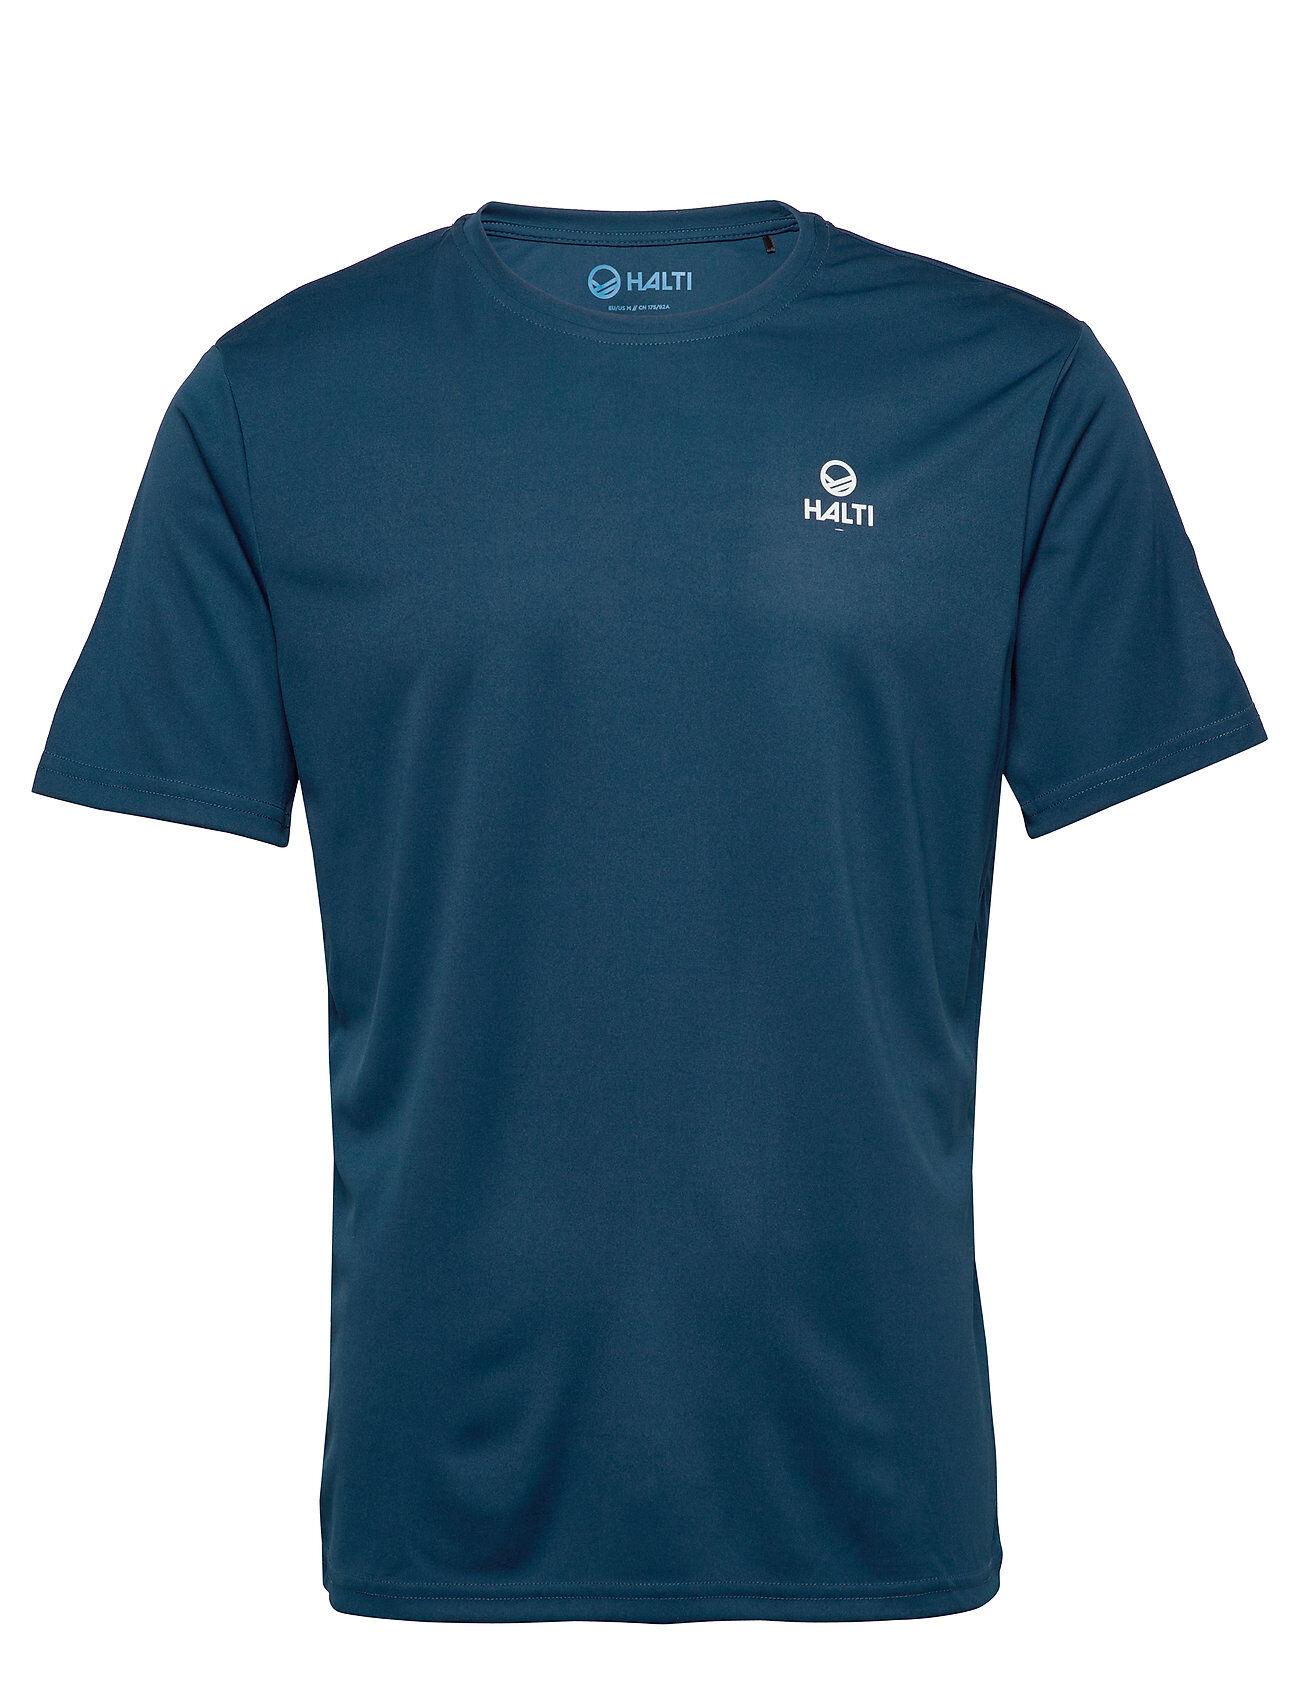 Halti Osku M T-Shirt T-shirts Short-sleeved Sininen Halti